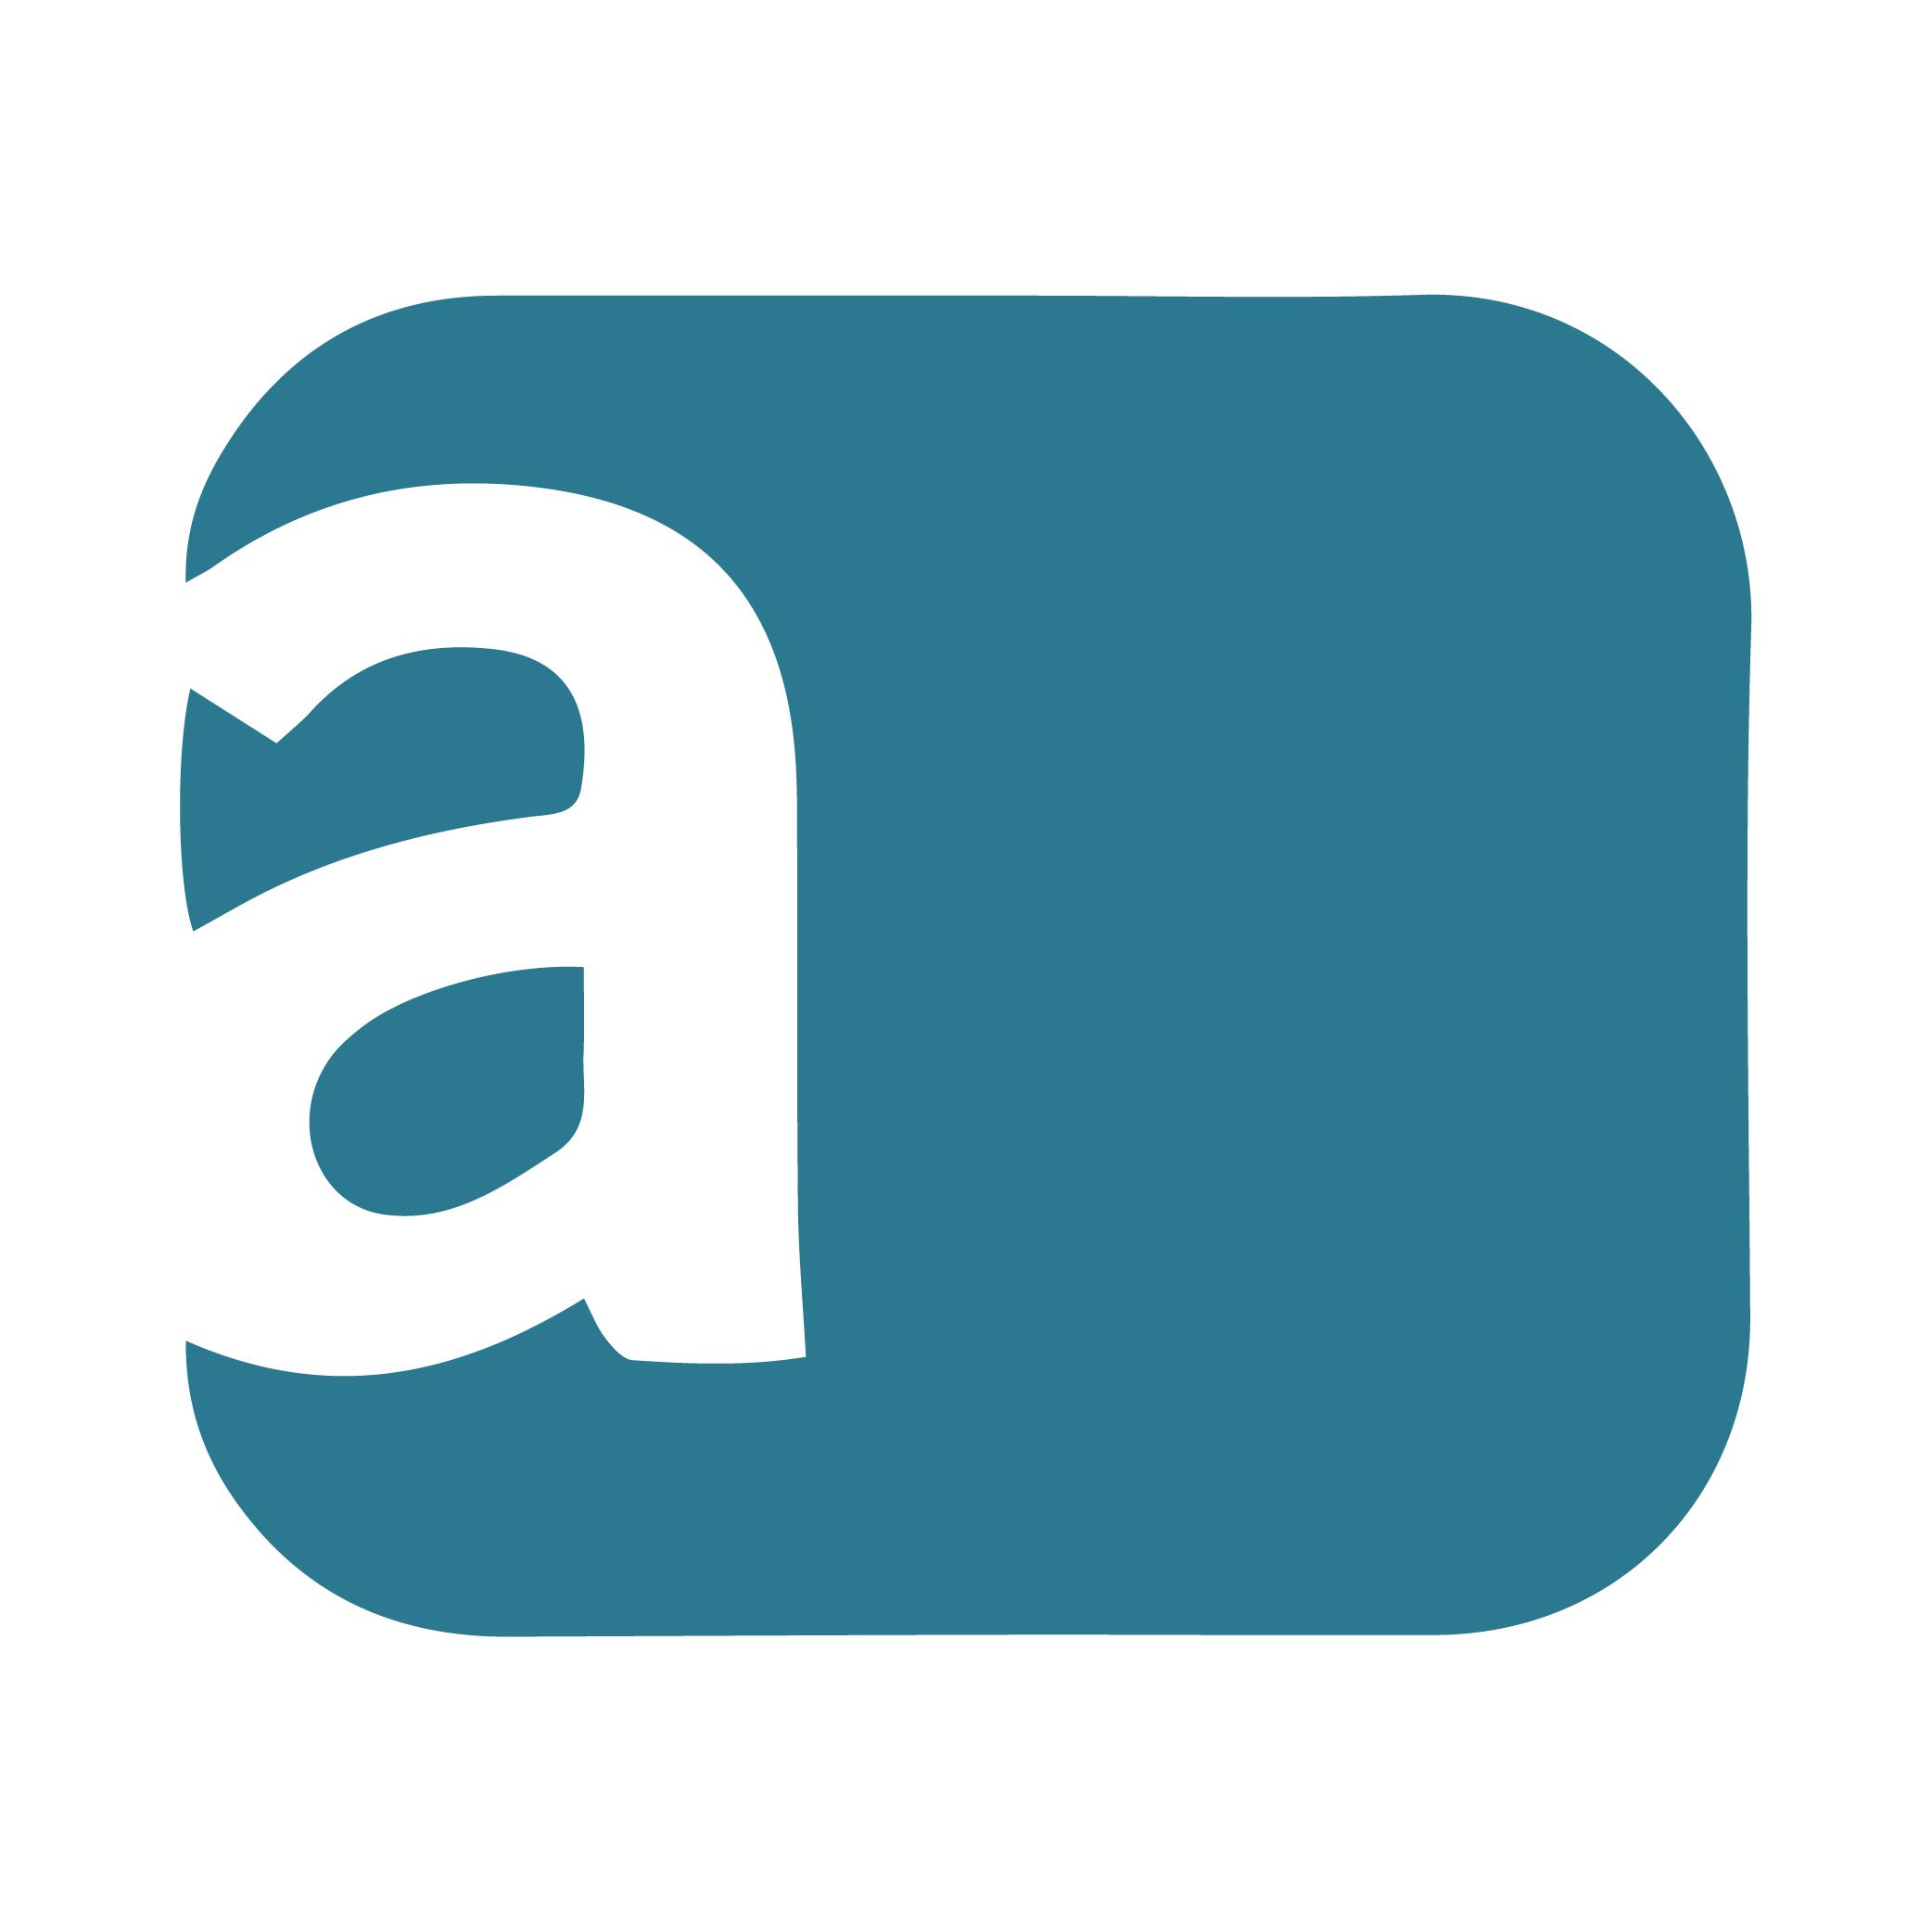 ToledoABC-WEBSITE-01.png#asset:4035